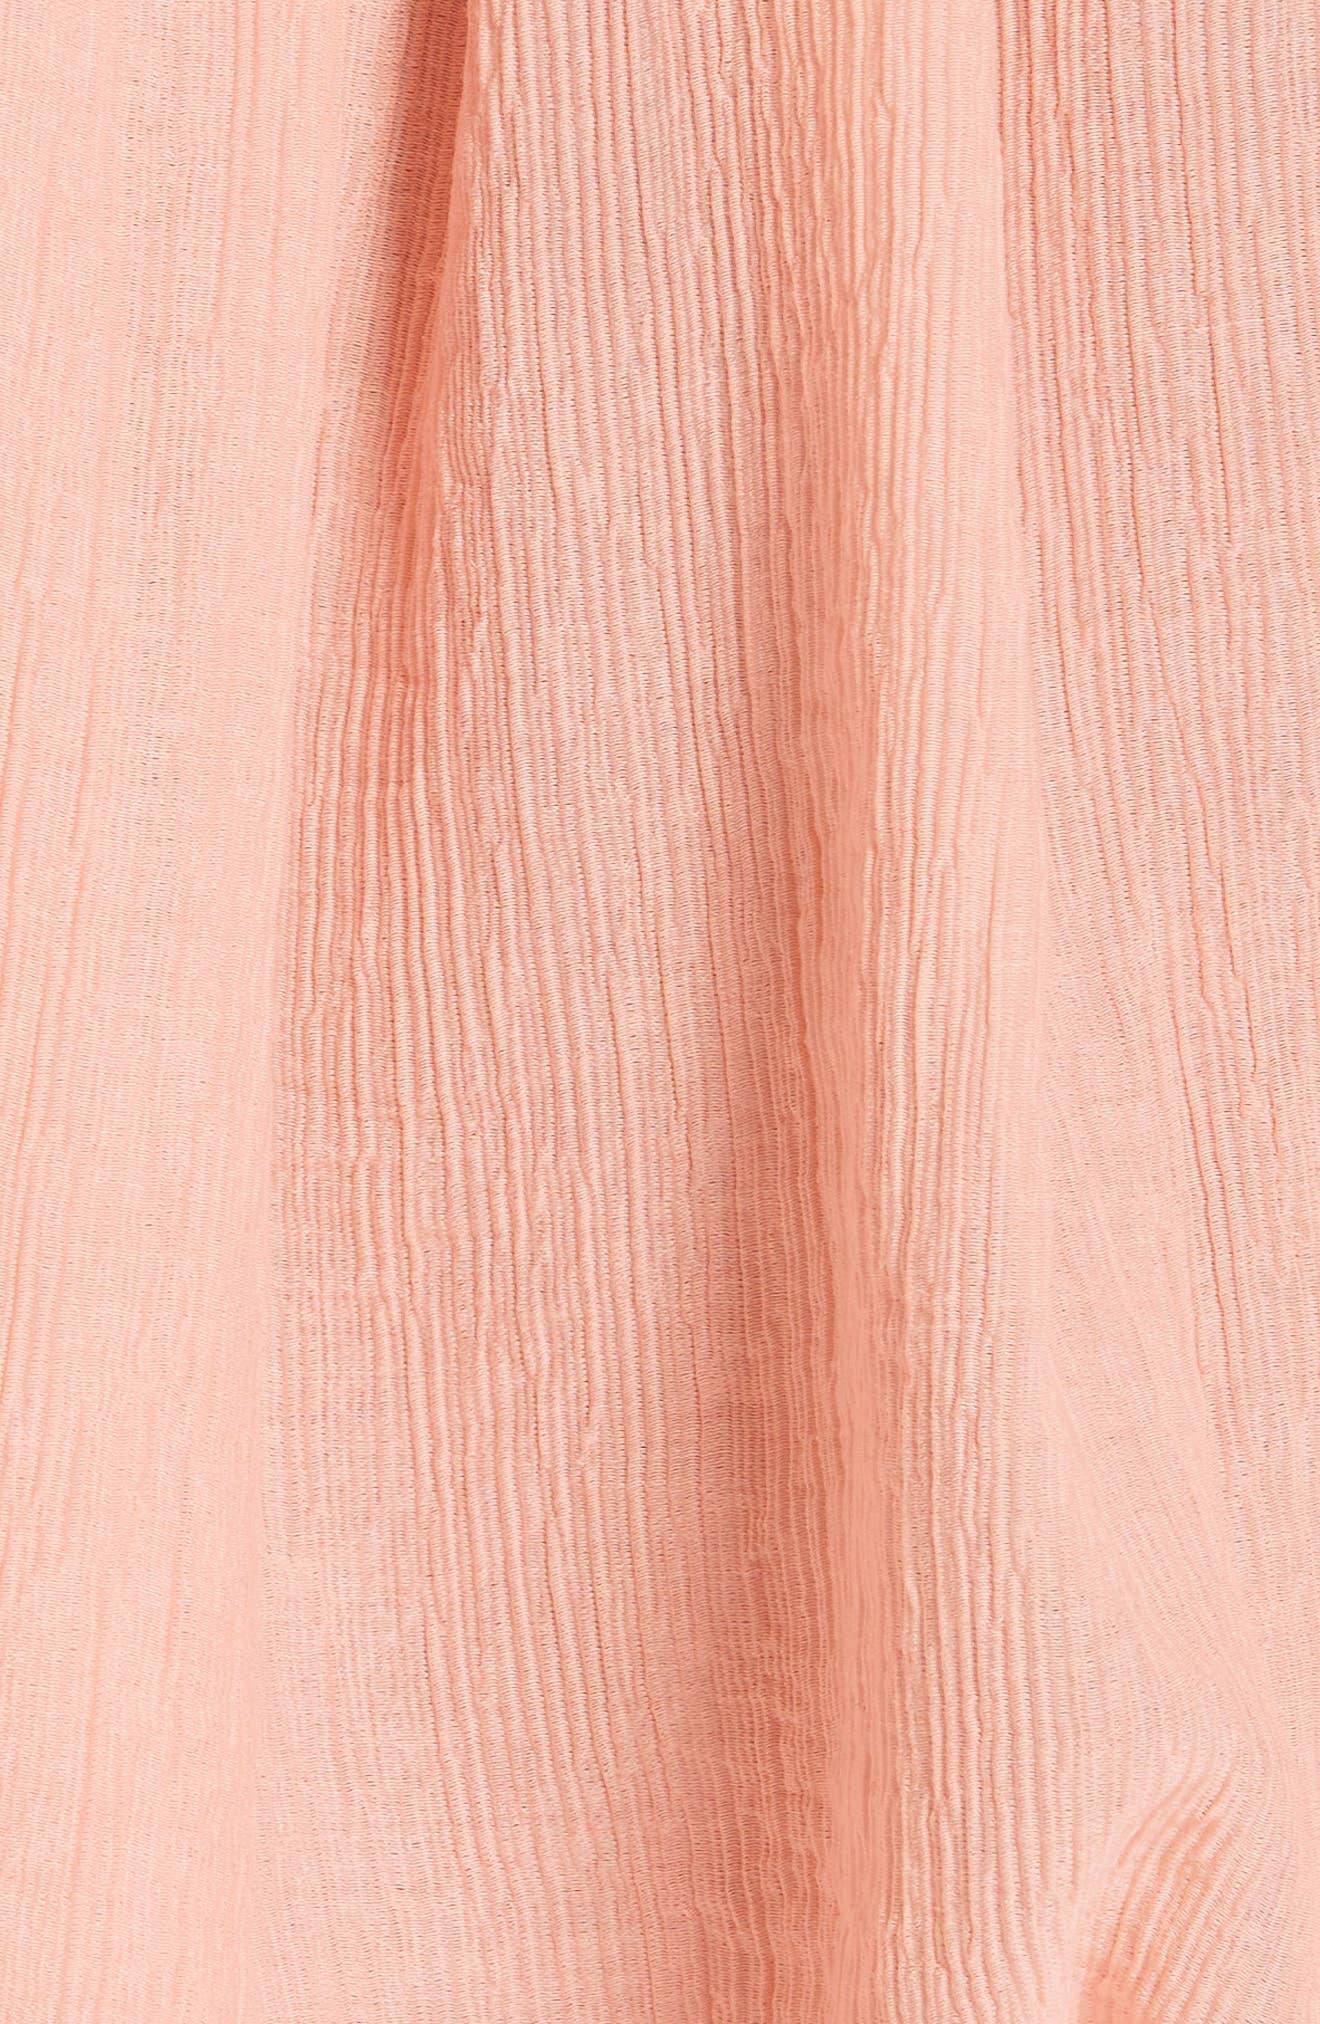 Elazara Ruched Sleeve Peasant Top,                             Alternate thumbnail 5, color,